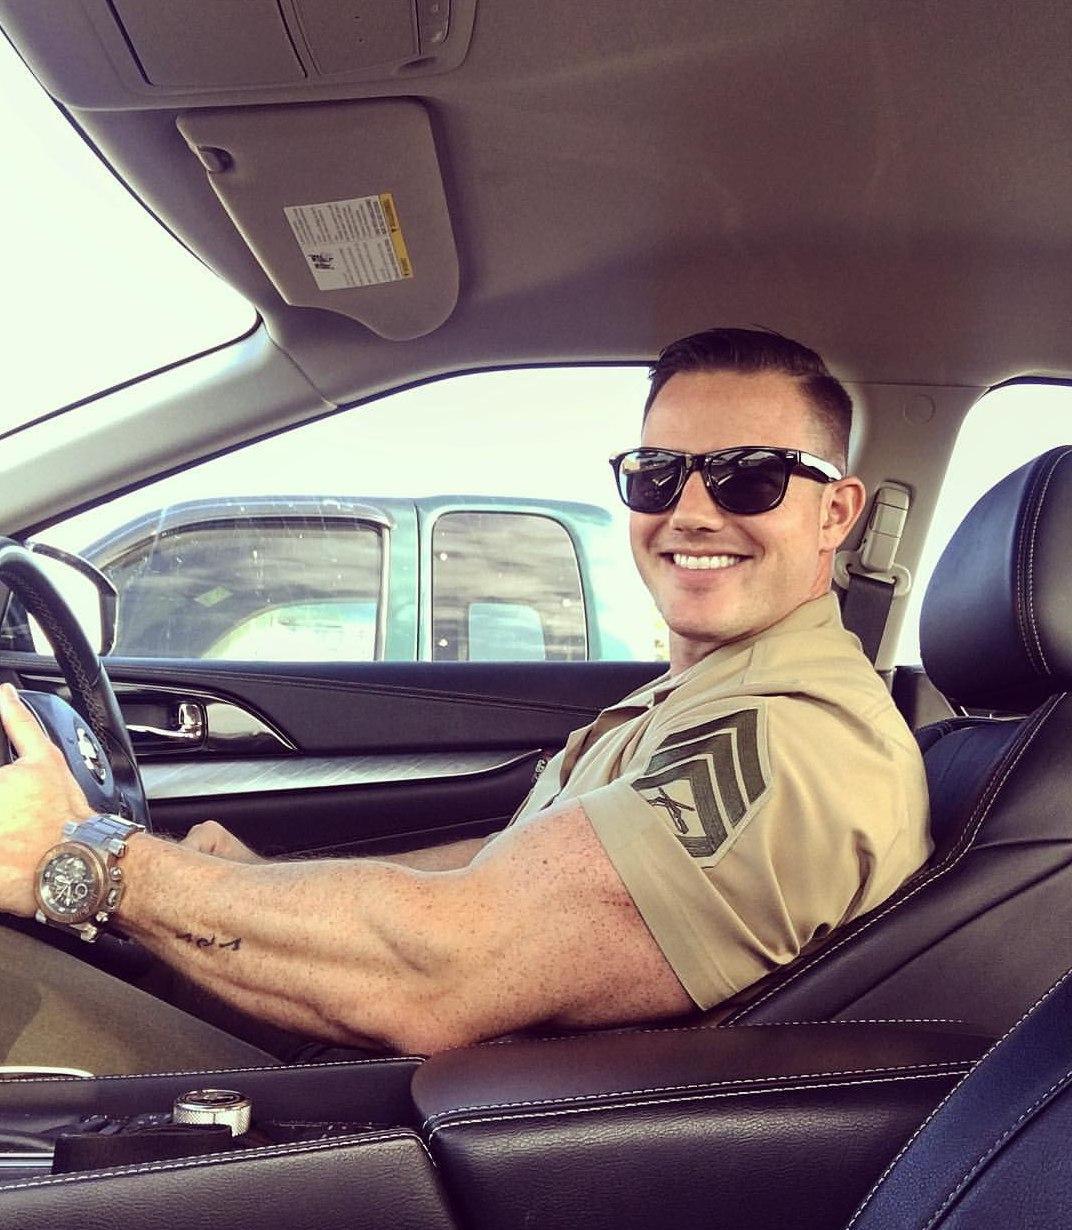 cute-hunky-car-driver-smiling-wearing-uniform-sunglasses-huge-muscle-biceps